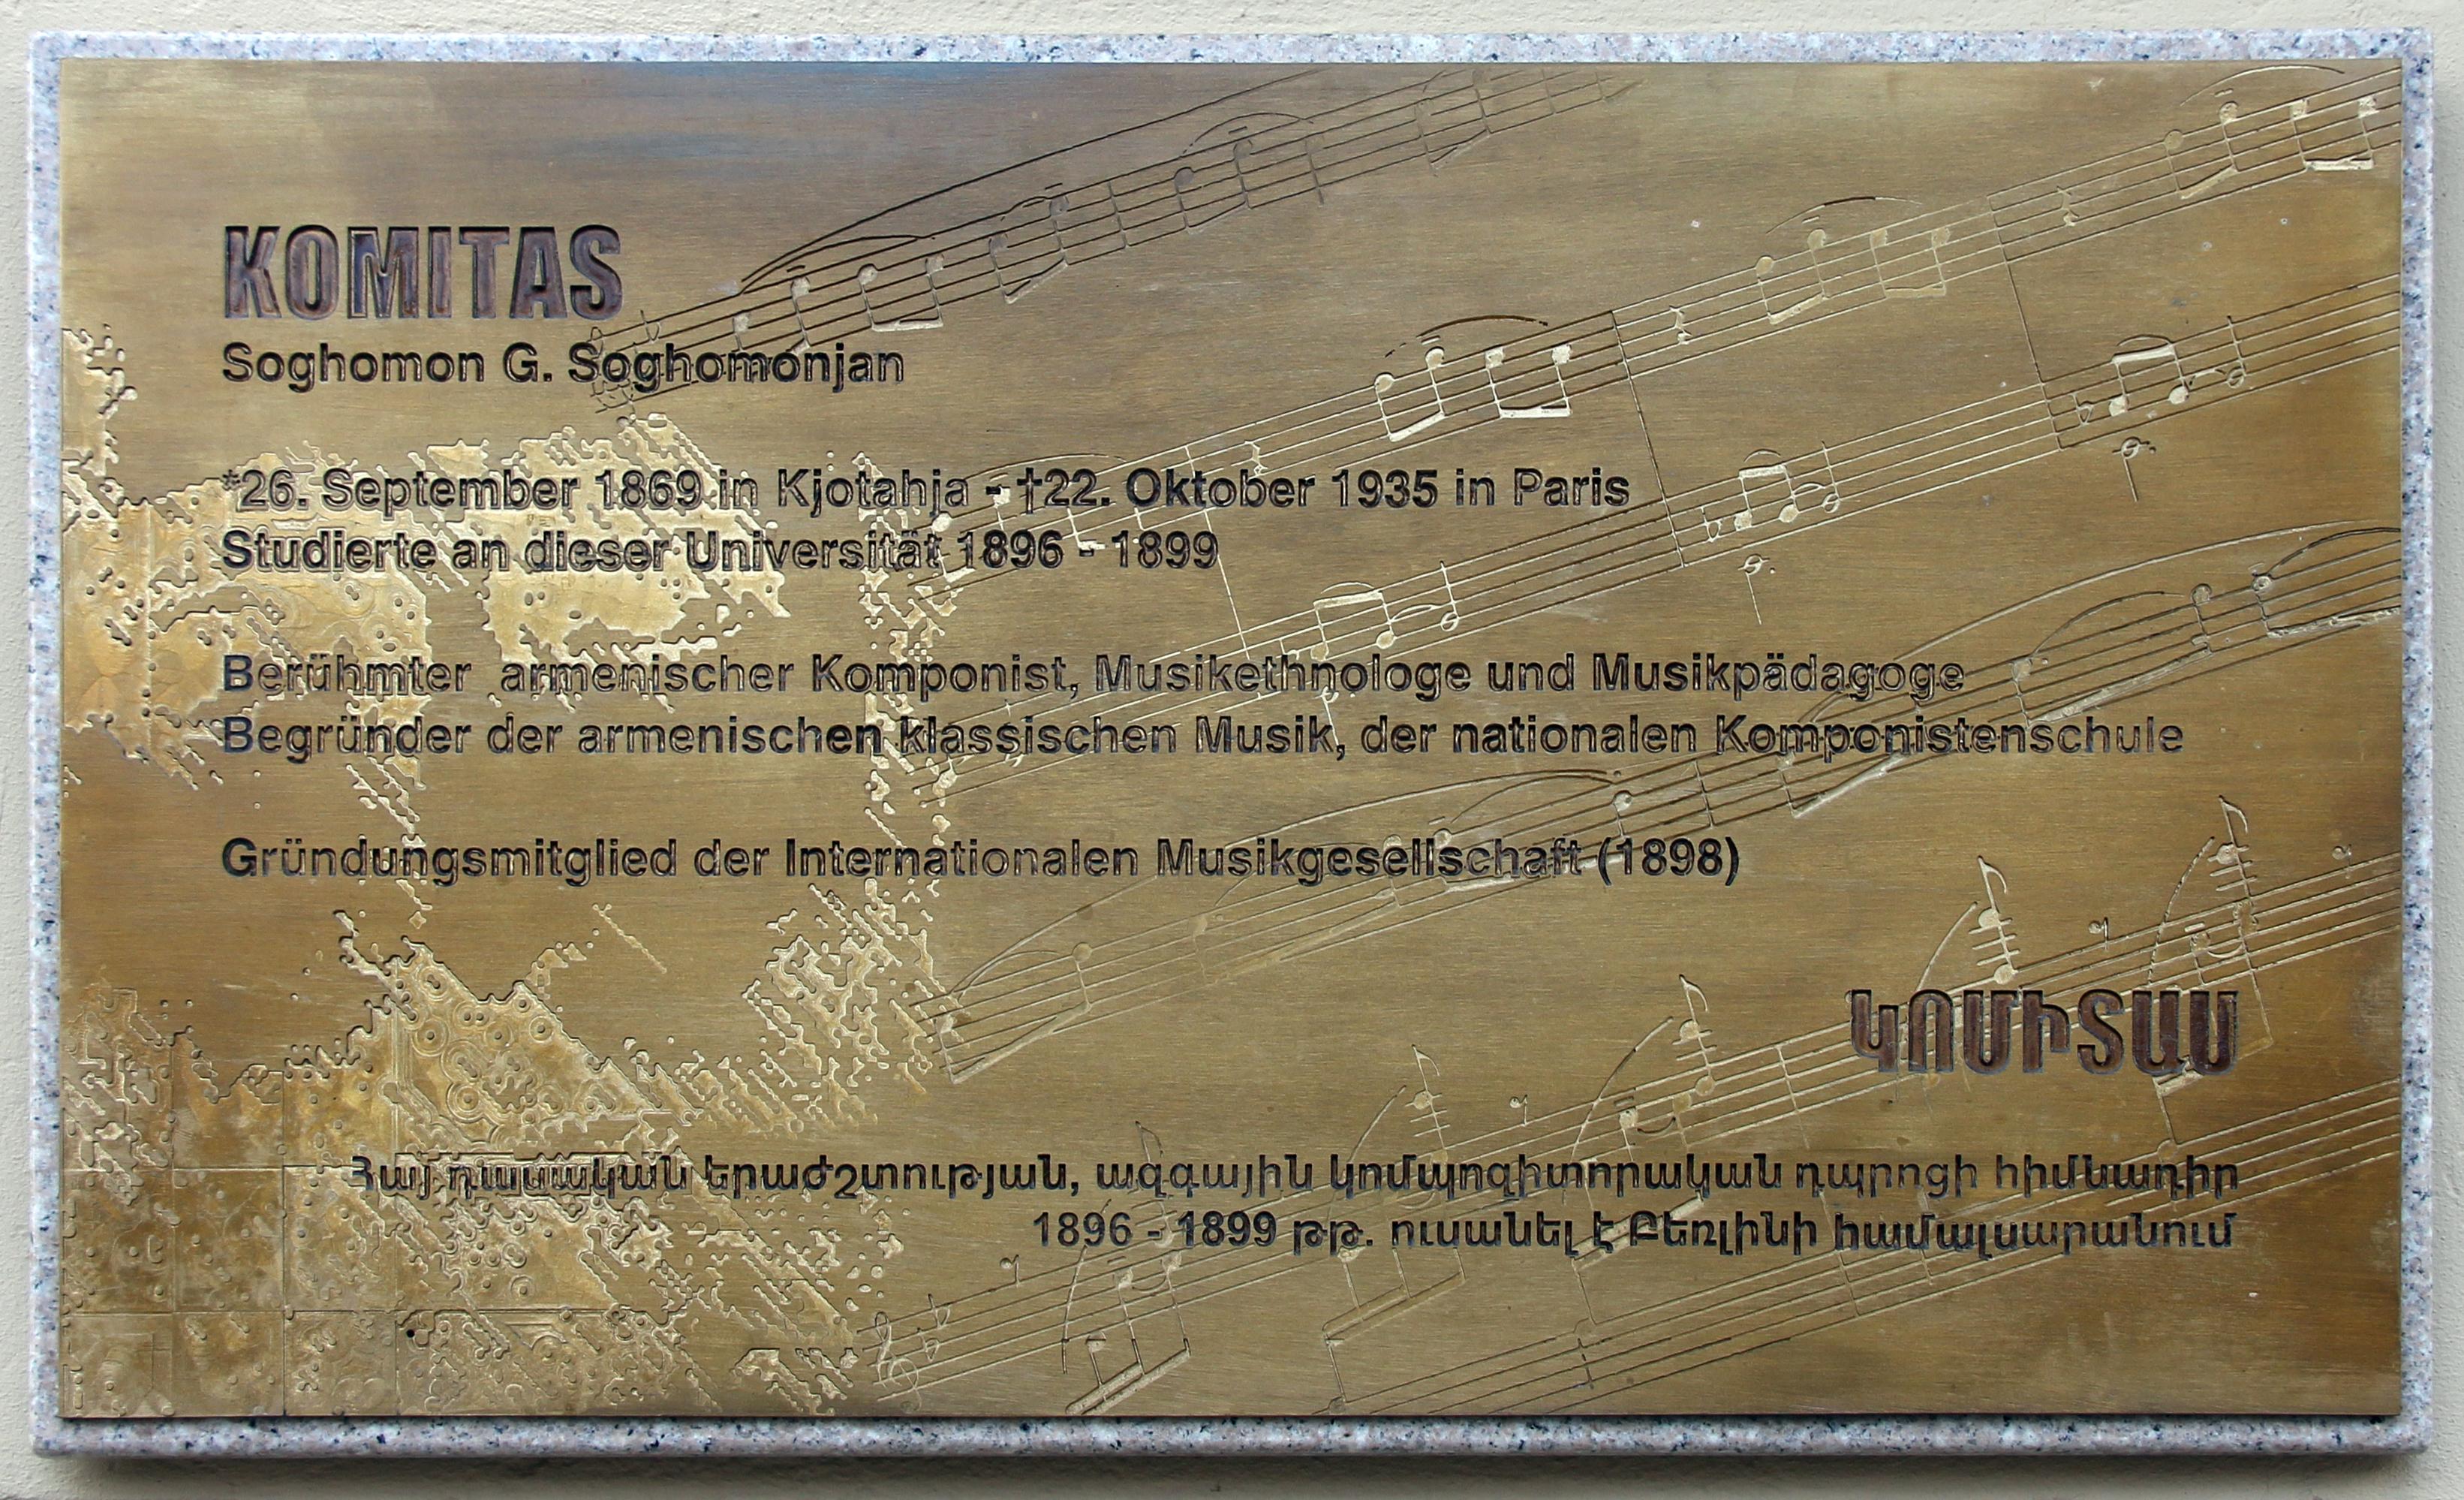 http://upload.wikimedia.org/wikipedia/commons/9/94/Gedenktafel_Am_Kupfergraben_5_%28Mitte%29_Soghomon_Gevorki_Soghomonjan.jpg